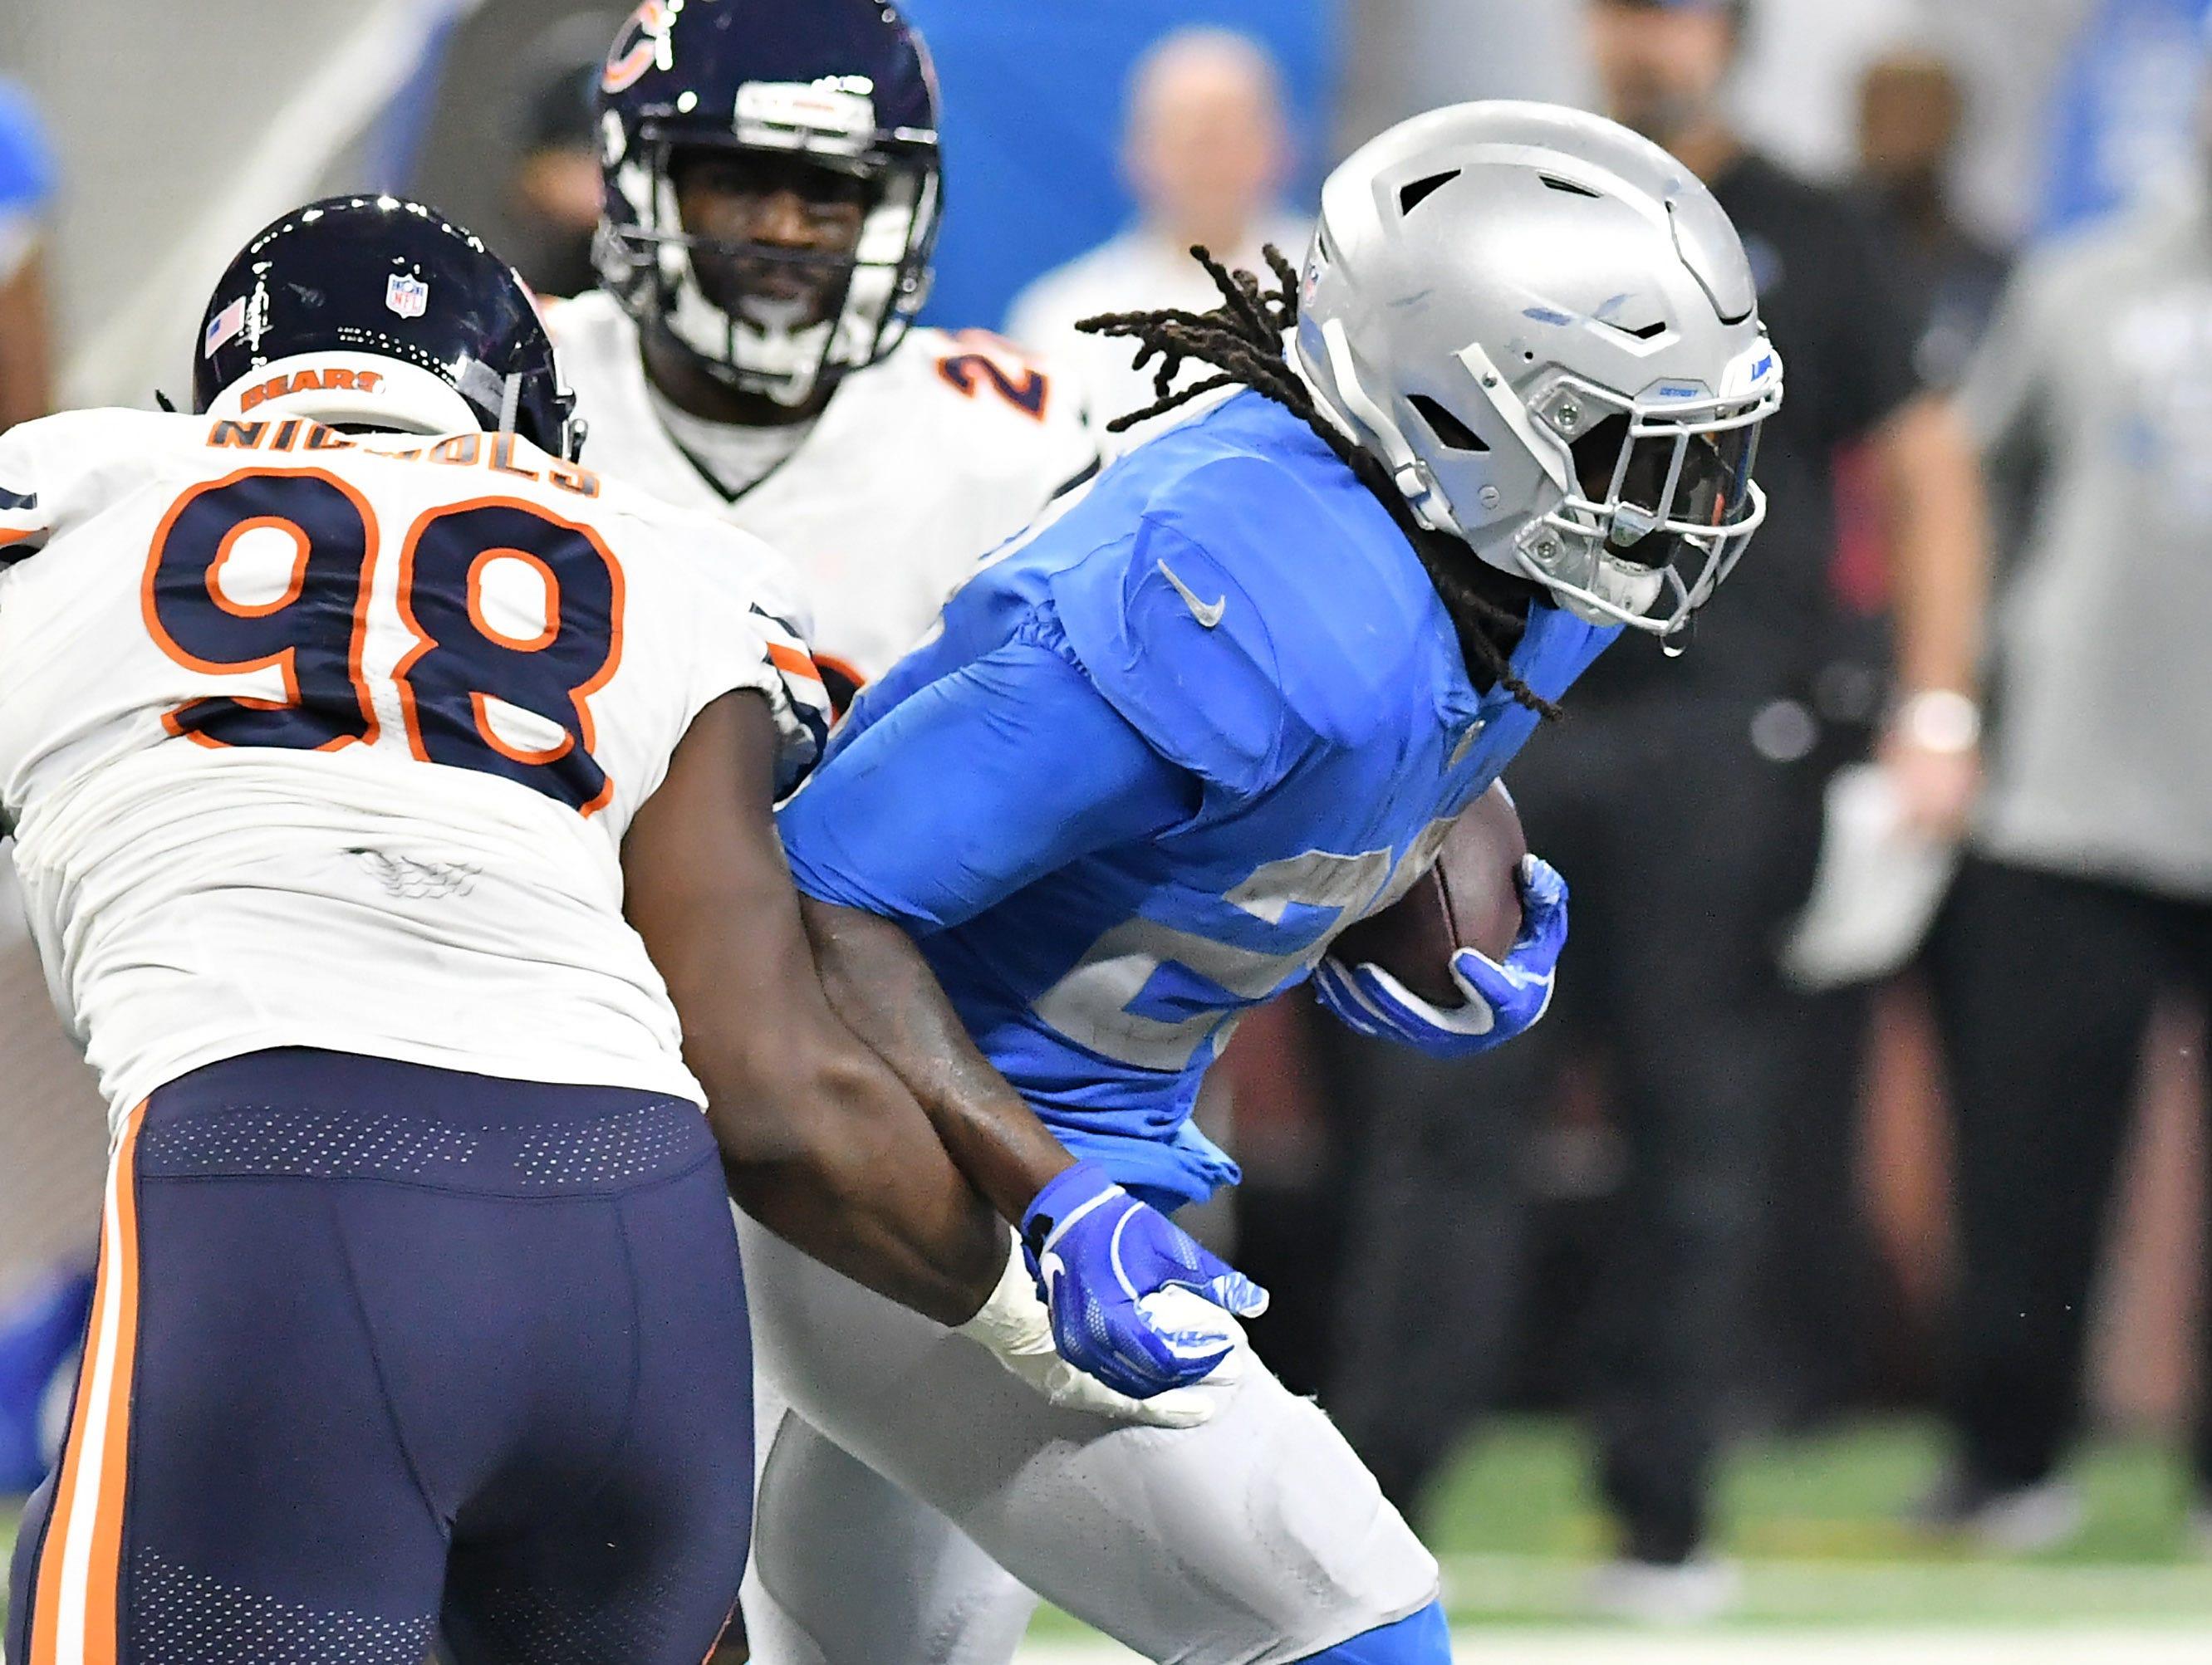 Lions running back LaGarrette Blount breaks free for long yardage In the fourth quarter.  Detroit Lions vs Chicago Bears on Thanksgiving Day at Ford Field in Detroit on Nov. 22, 2018.  Bears win, 23-16.(Robin Buckson / Detroit News)